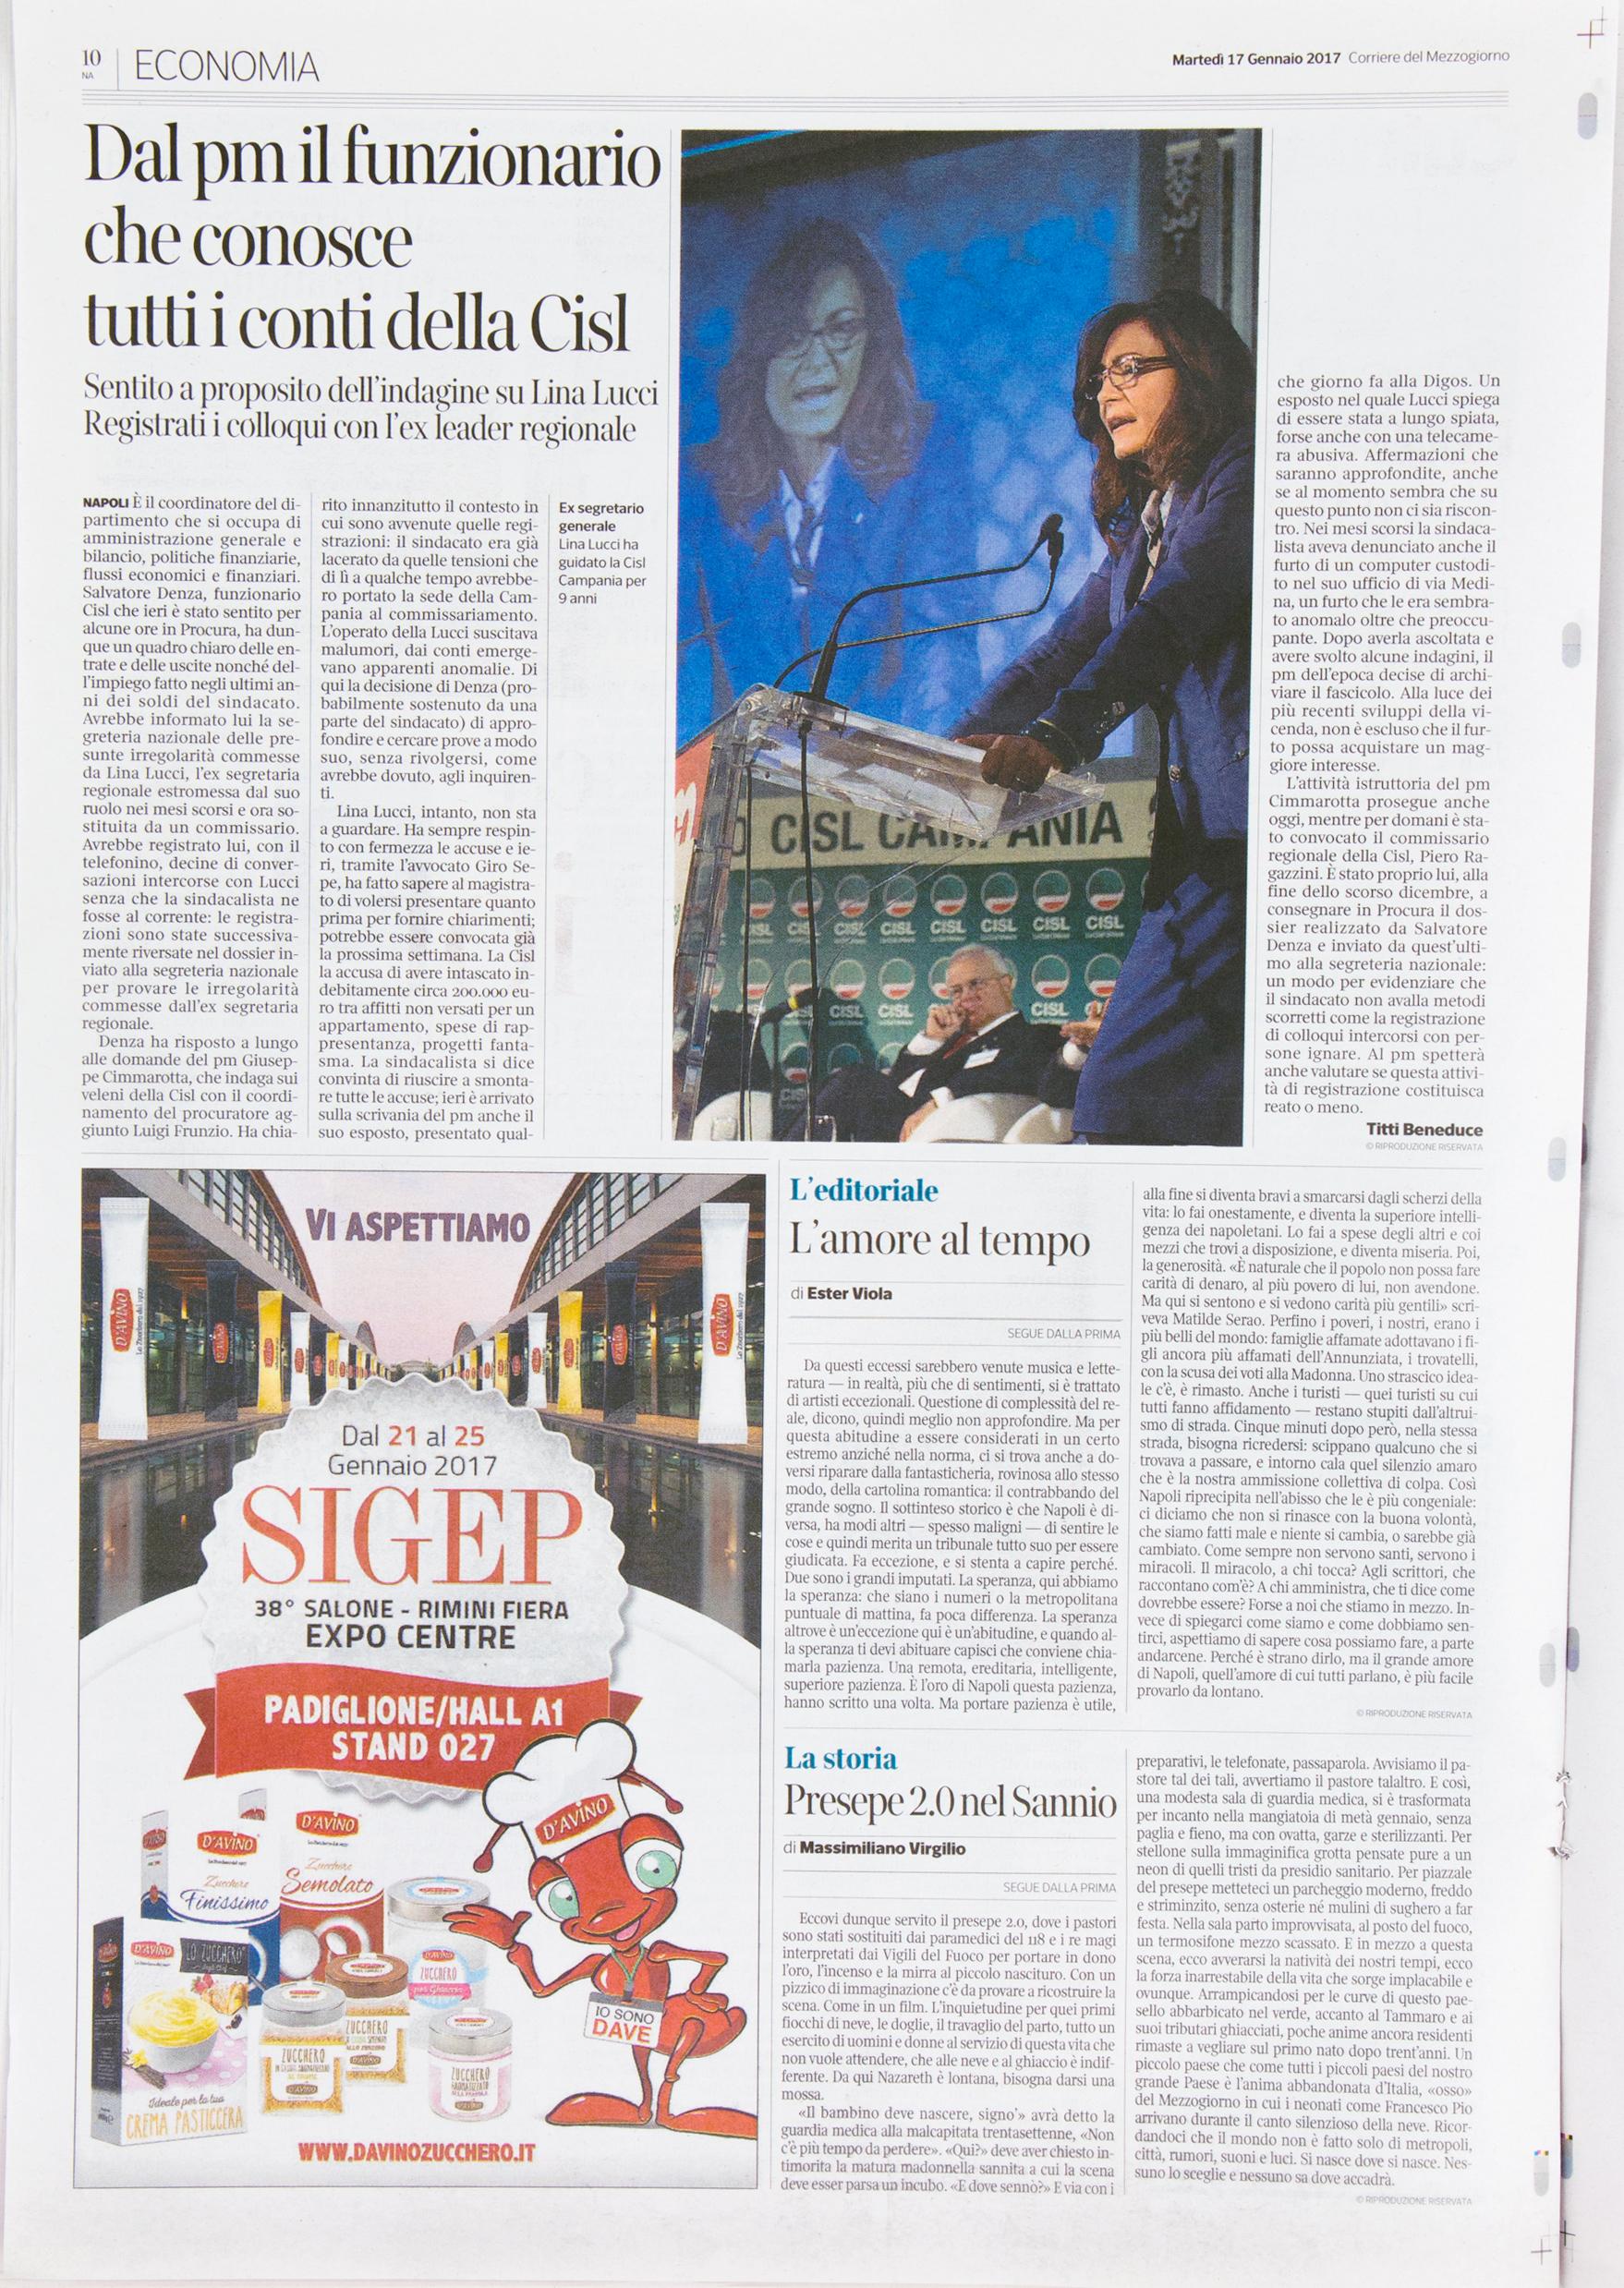 davino_sigep2017_giornale